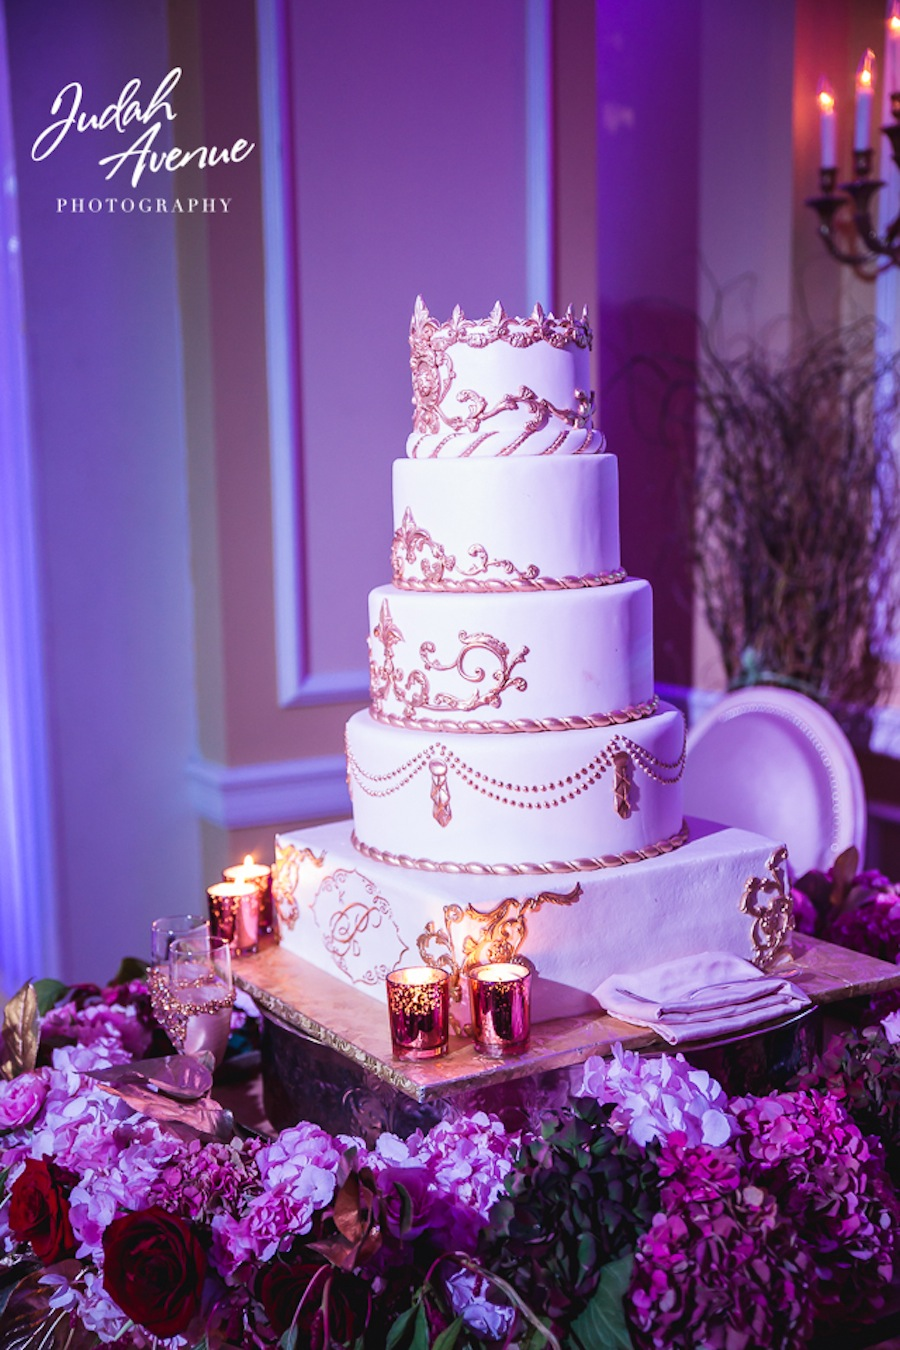 Krystle-Deonte-wedding-at-Willard-Intercontinental-wedding-photography-in-washington-dc-maryland-virginia-714.jpg